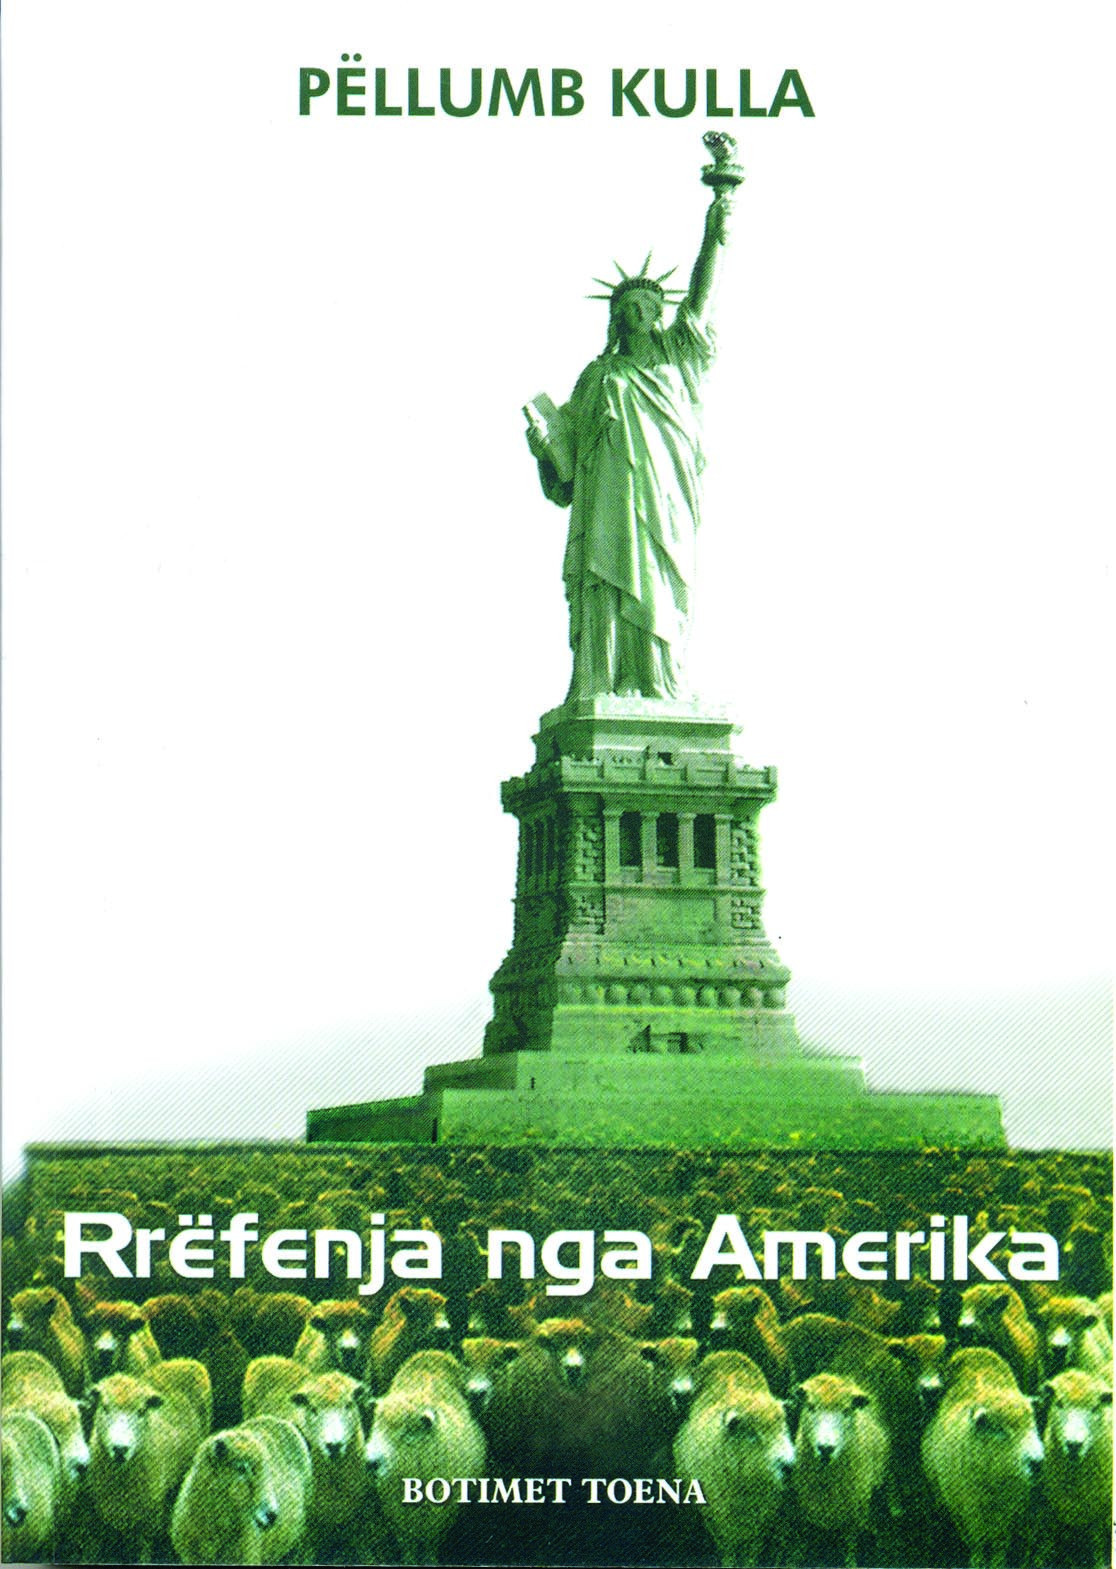 Rrefenja nga Amerika